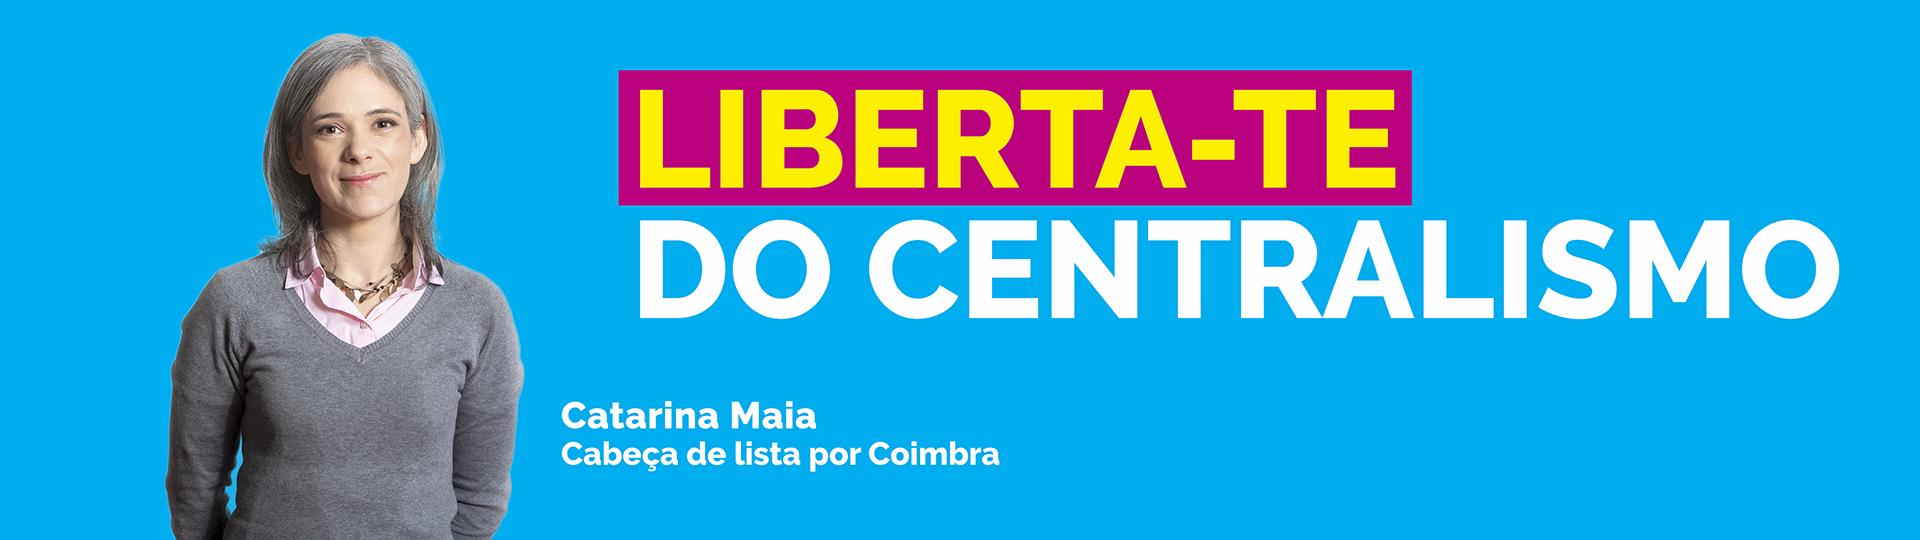 LEG19 - Banner wide centralismo